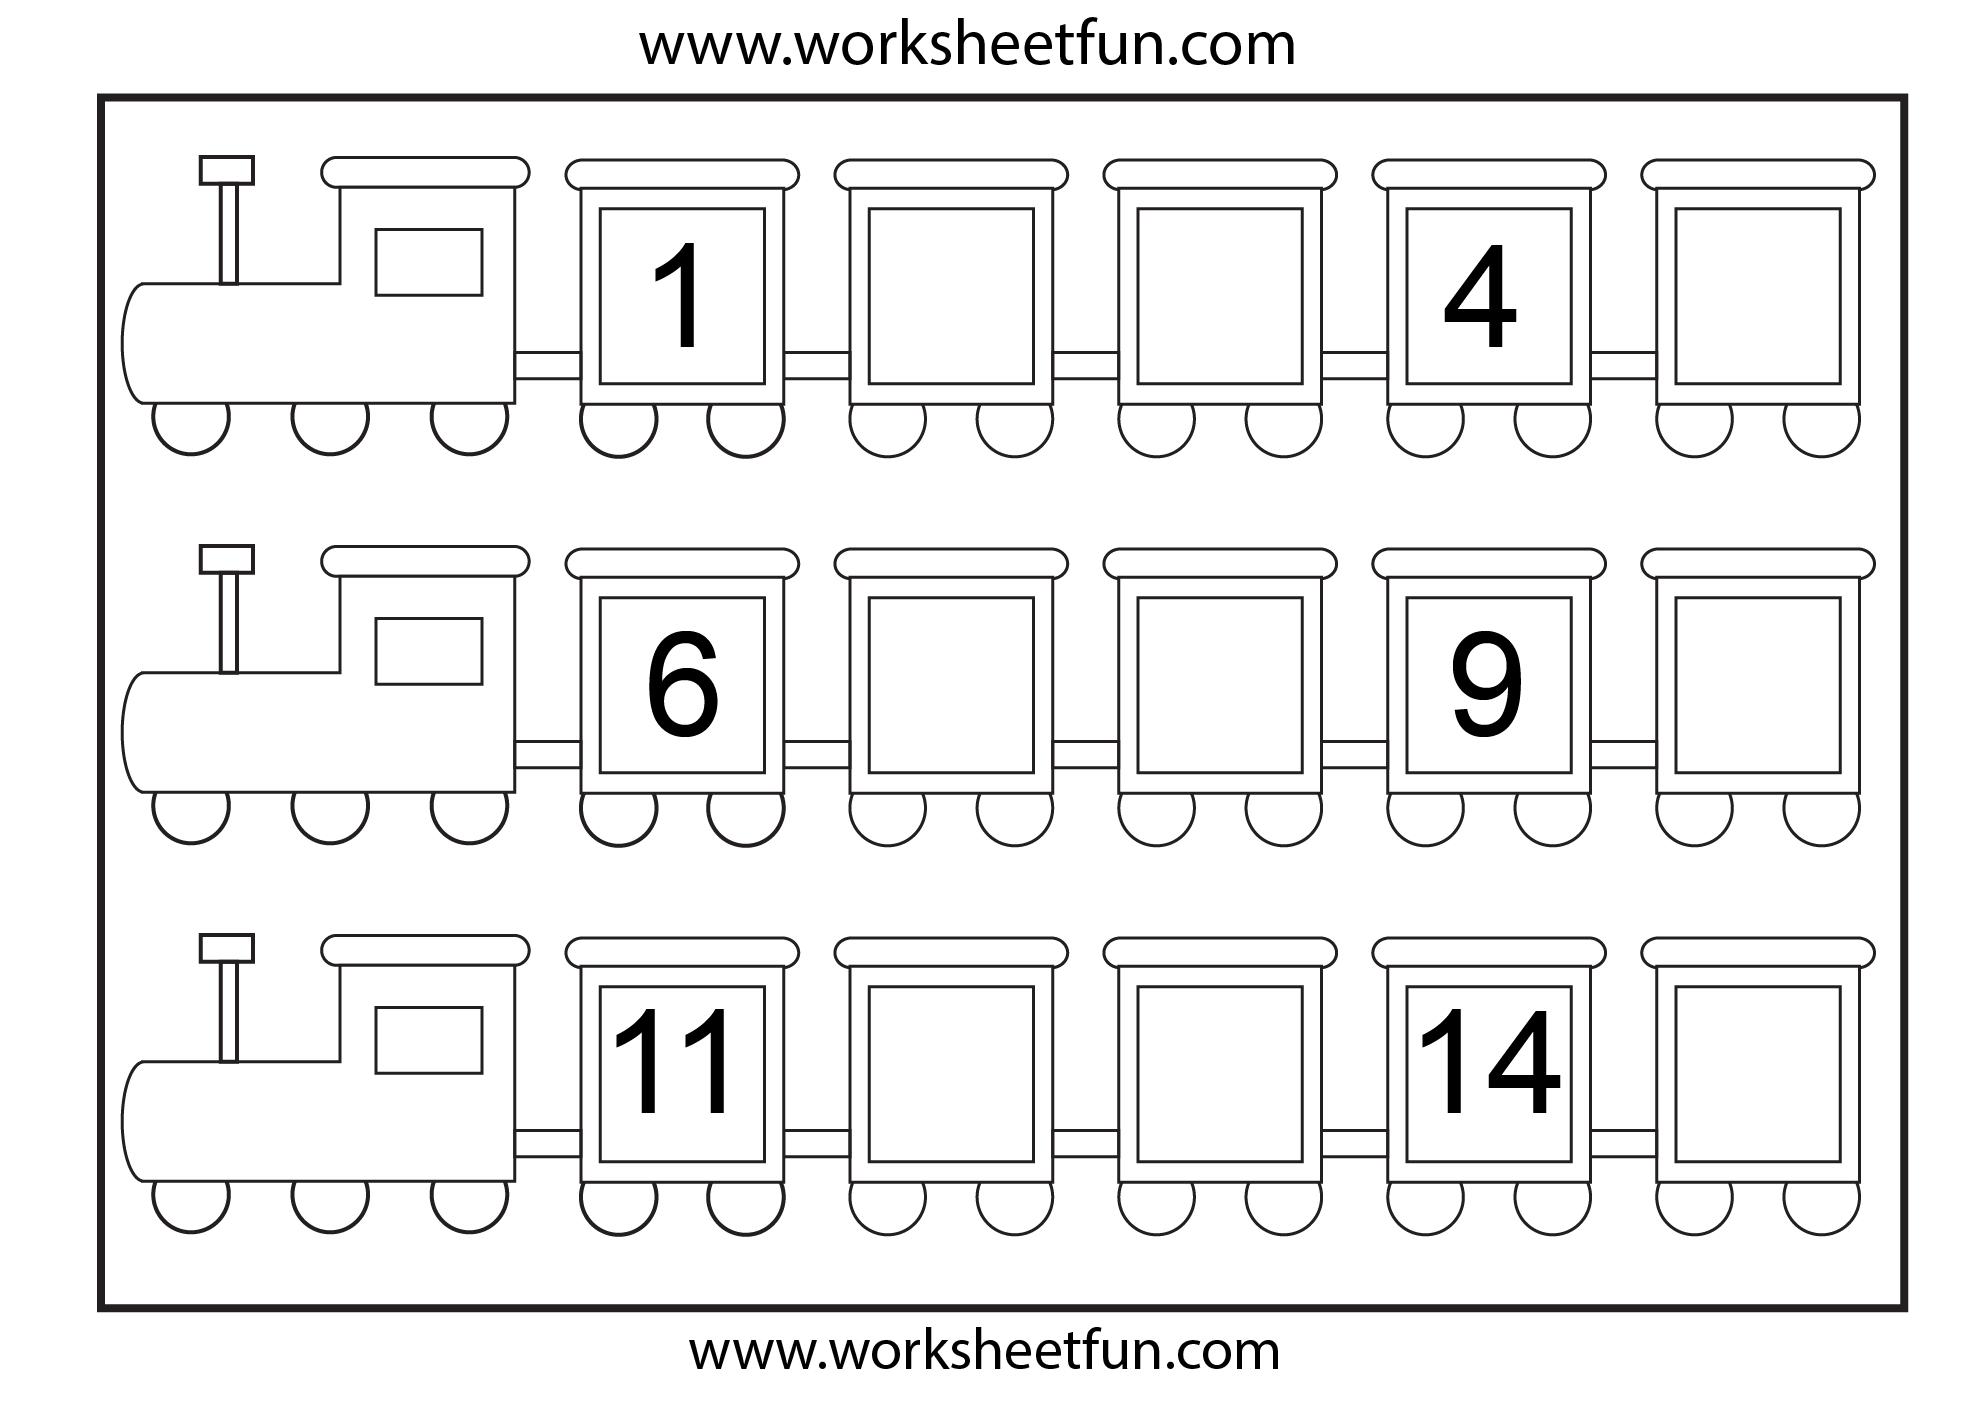 Preschool Missing Number Worksheets   Number Train – Missing Numbers - Free Printable Missing Number Worksheets